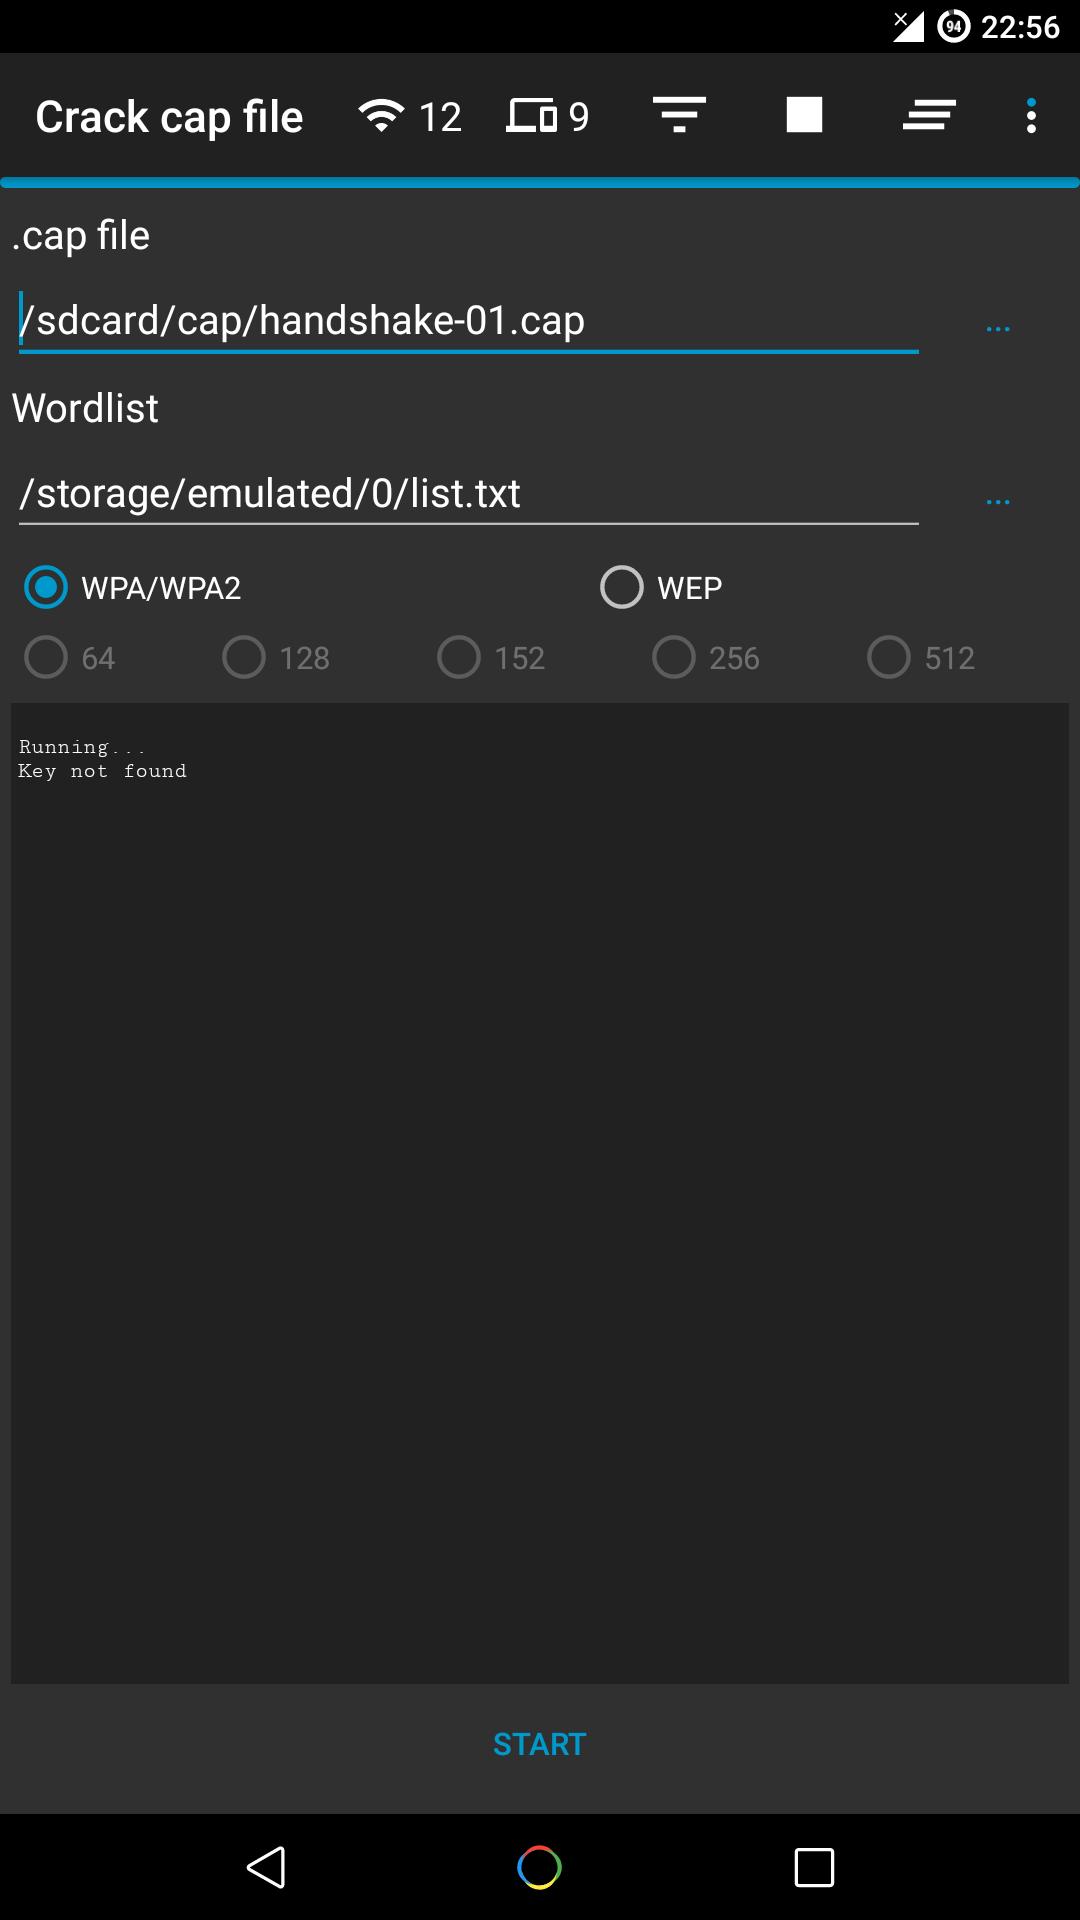 Hijacker | Kali NetHunter App Store - Android App Repository